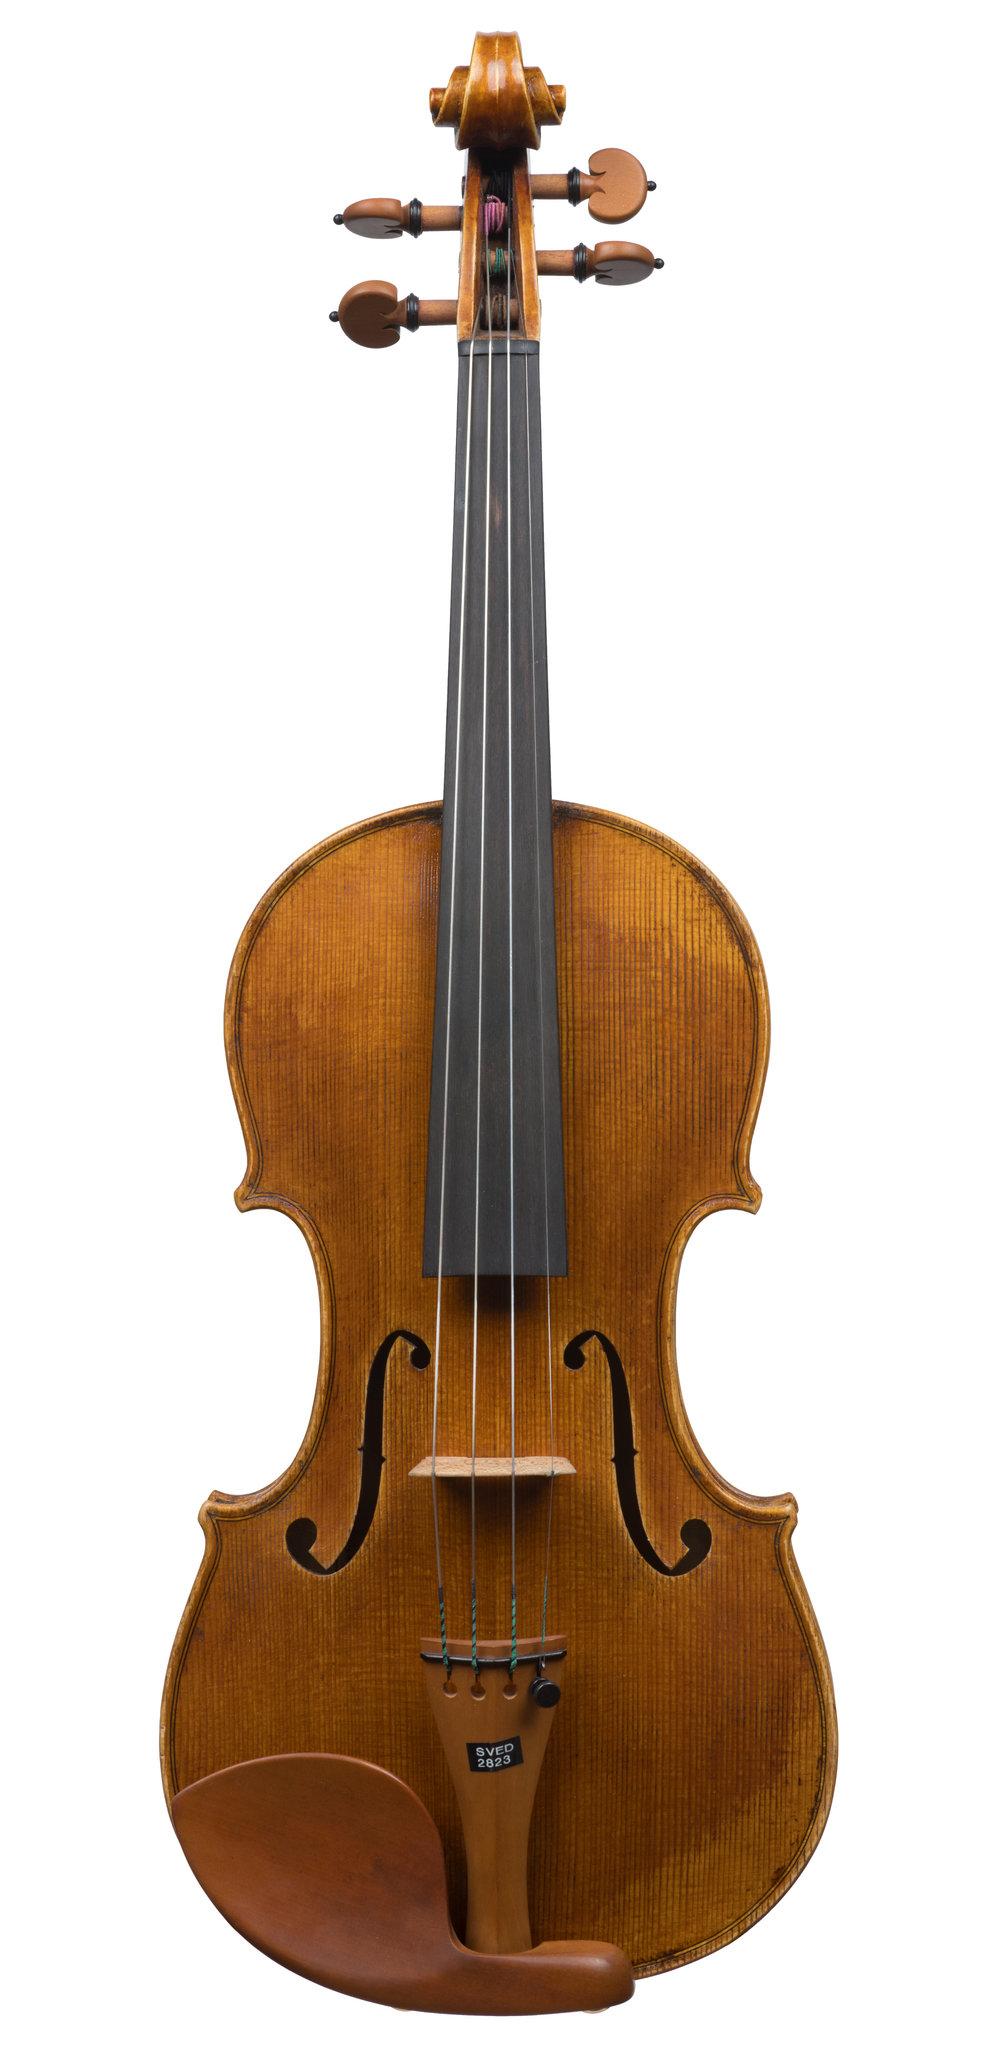 Drew Harding violin, Chicago, 2016 -